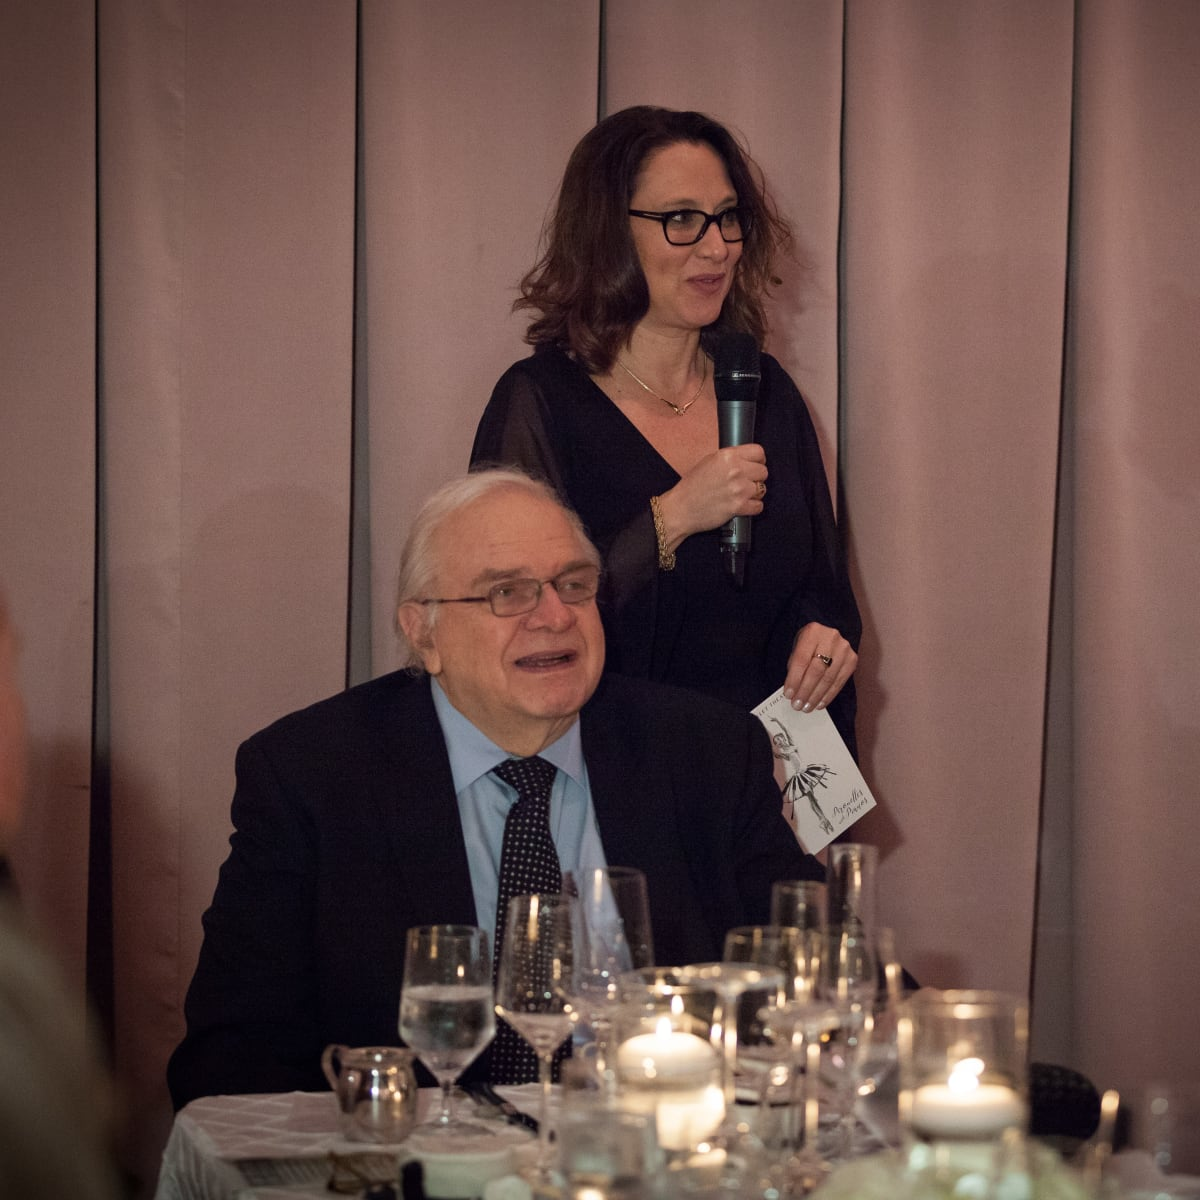 TBT artistic director Ben Stevenson, O.B.E. and Executive Director Vanessa Logan, TBT Gala 2018